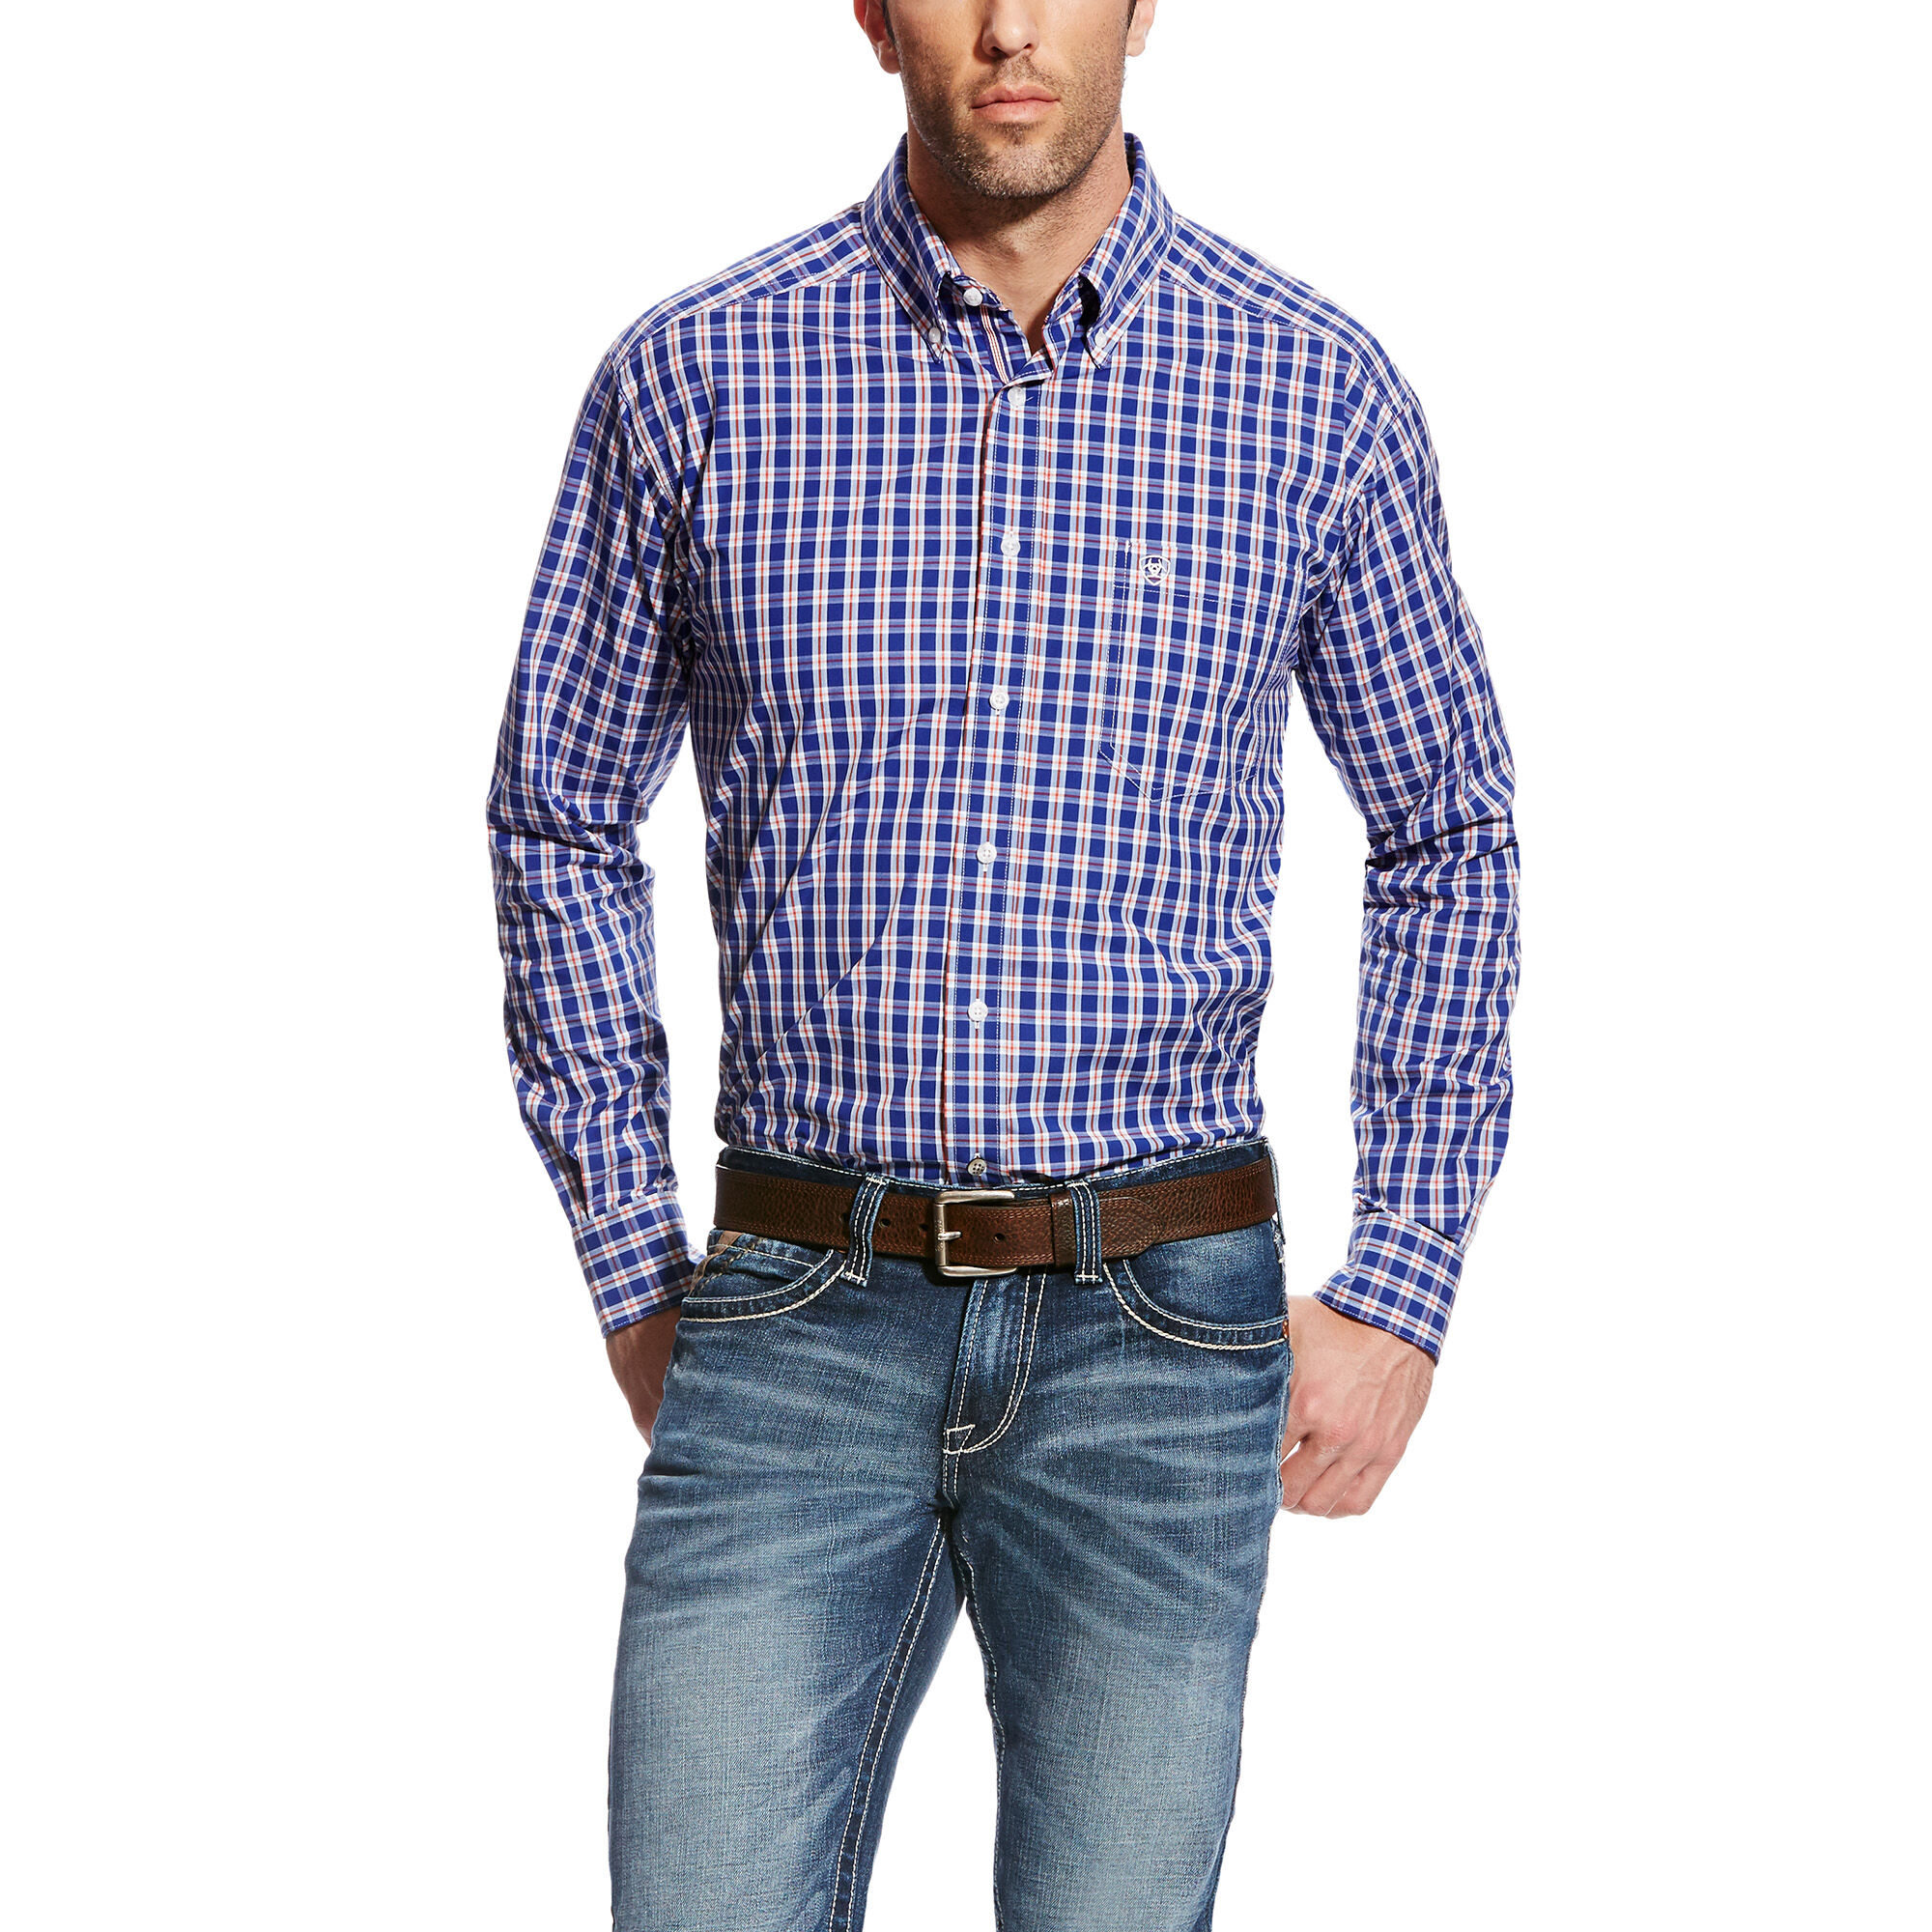 Pro Series Darius Shirt